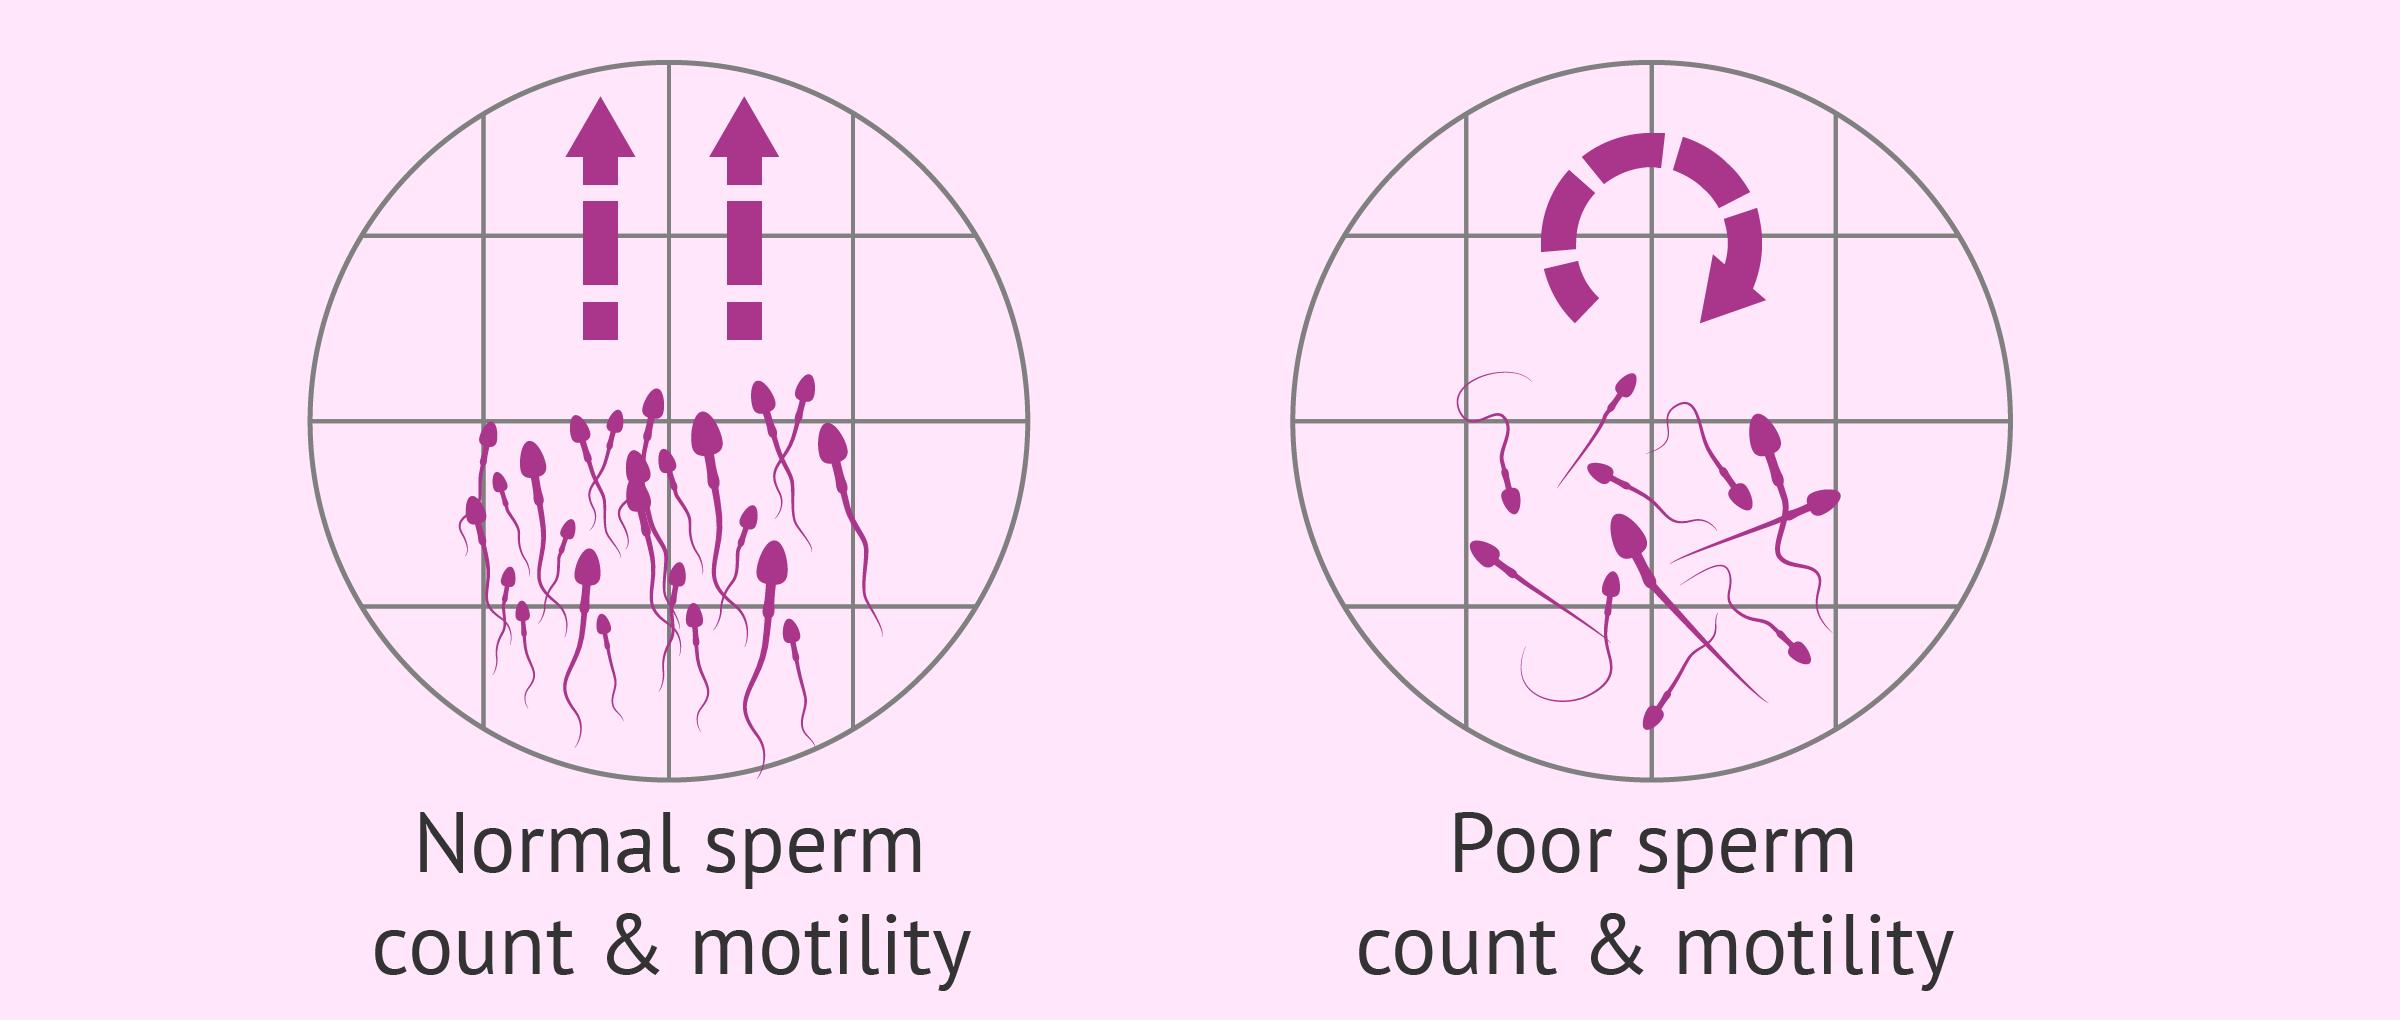 clinics of perform sperm seperation